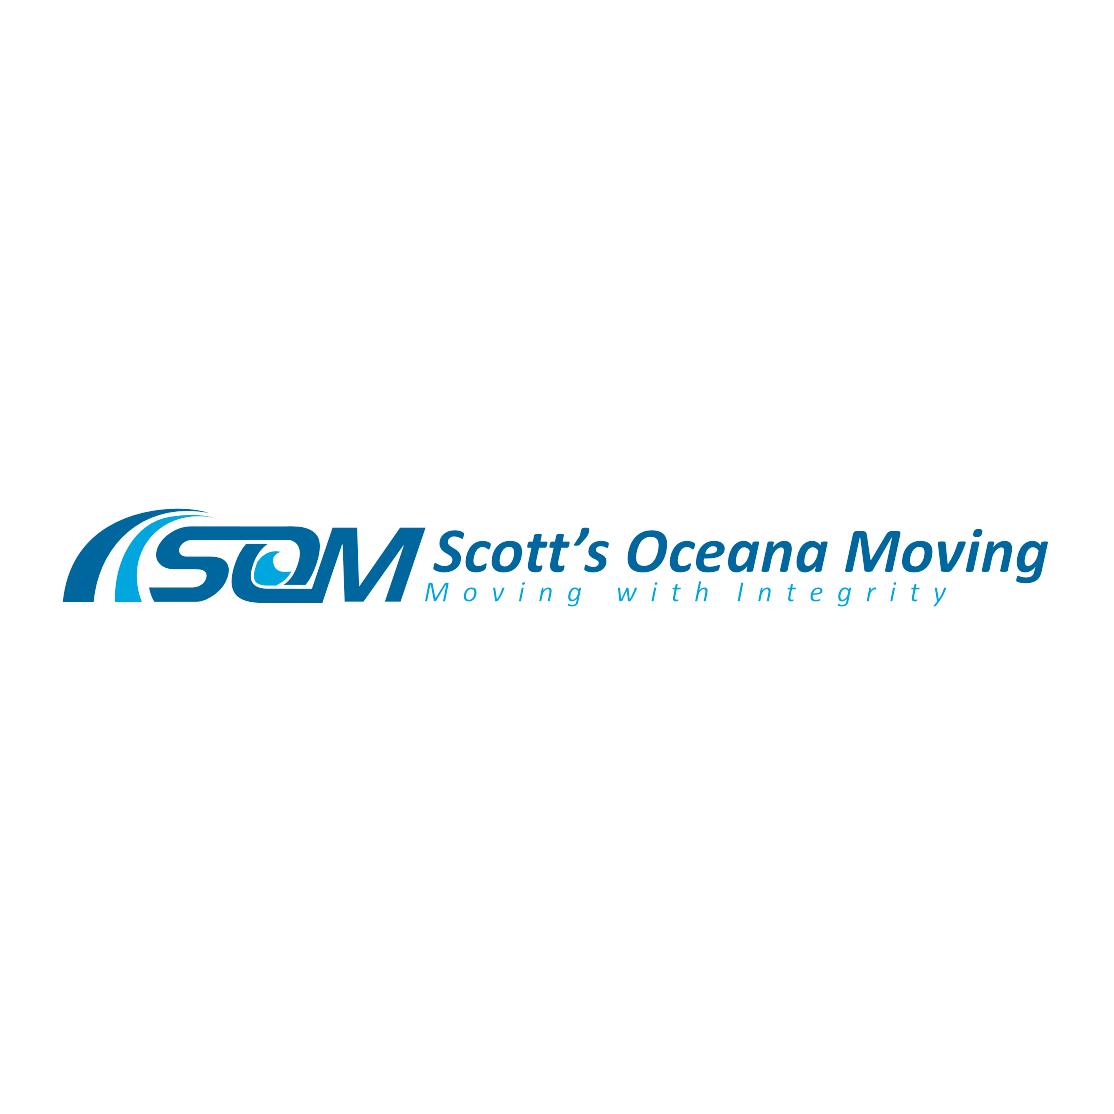 Scotts Oceana Moving - Virginia Beach, VA - Movers